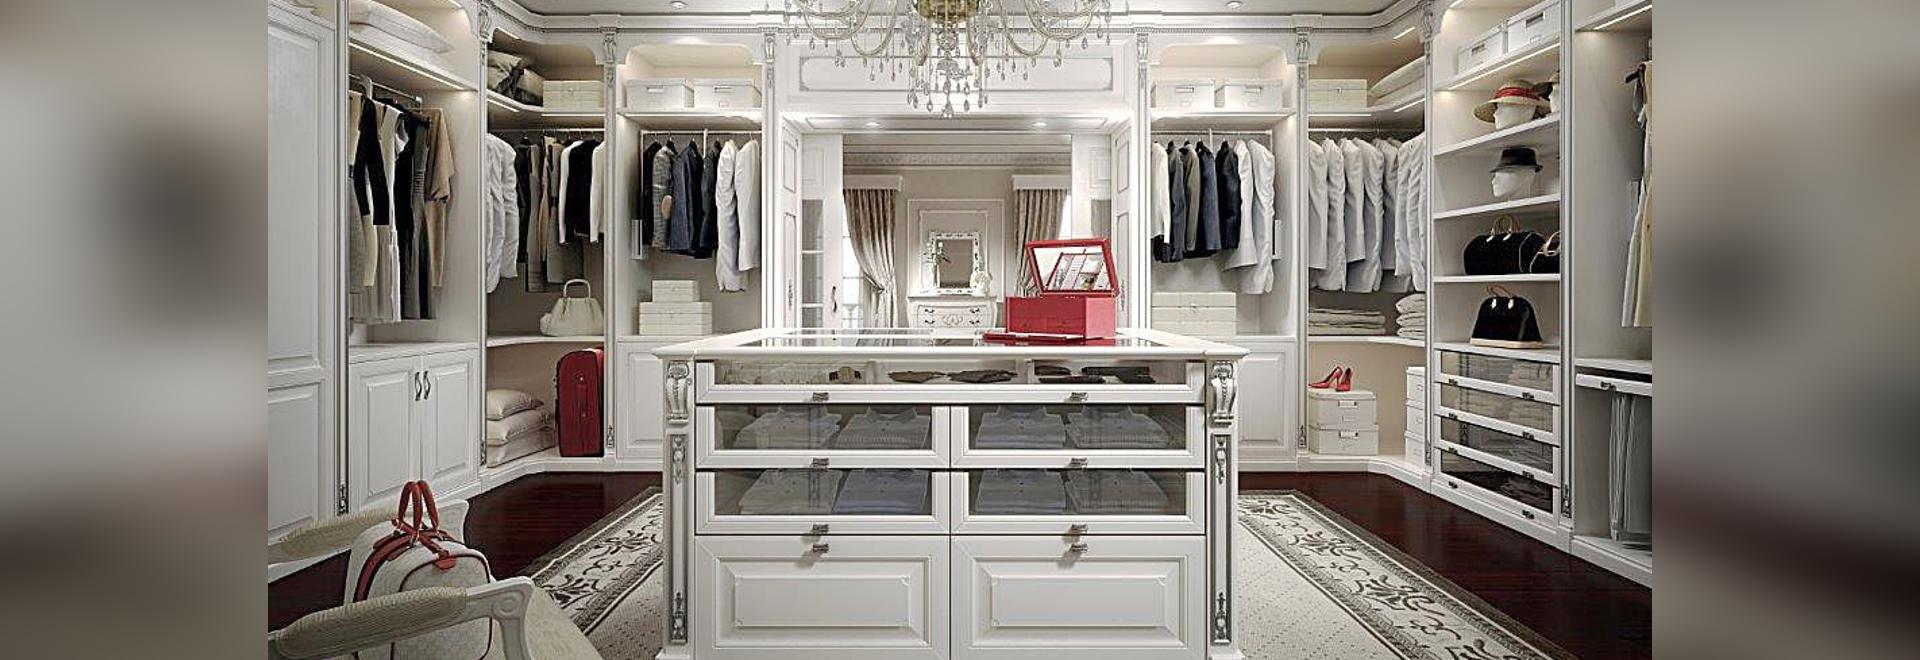 Cabine armadio su misura - Modenese Gastone Luxury Classic Furniture